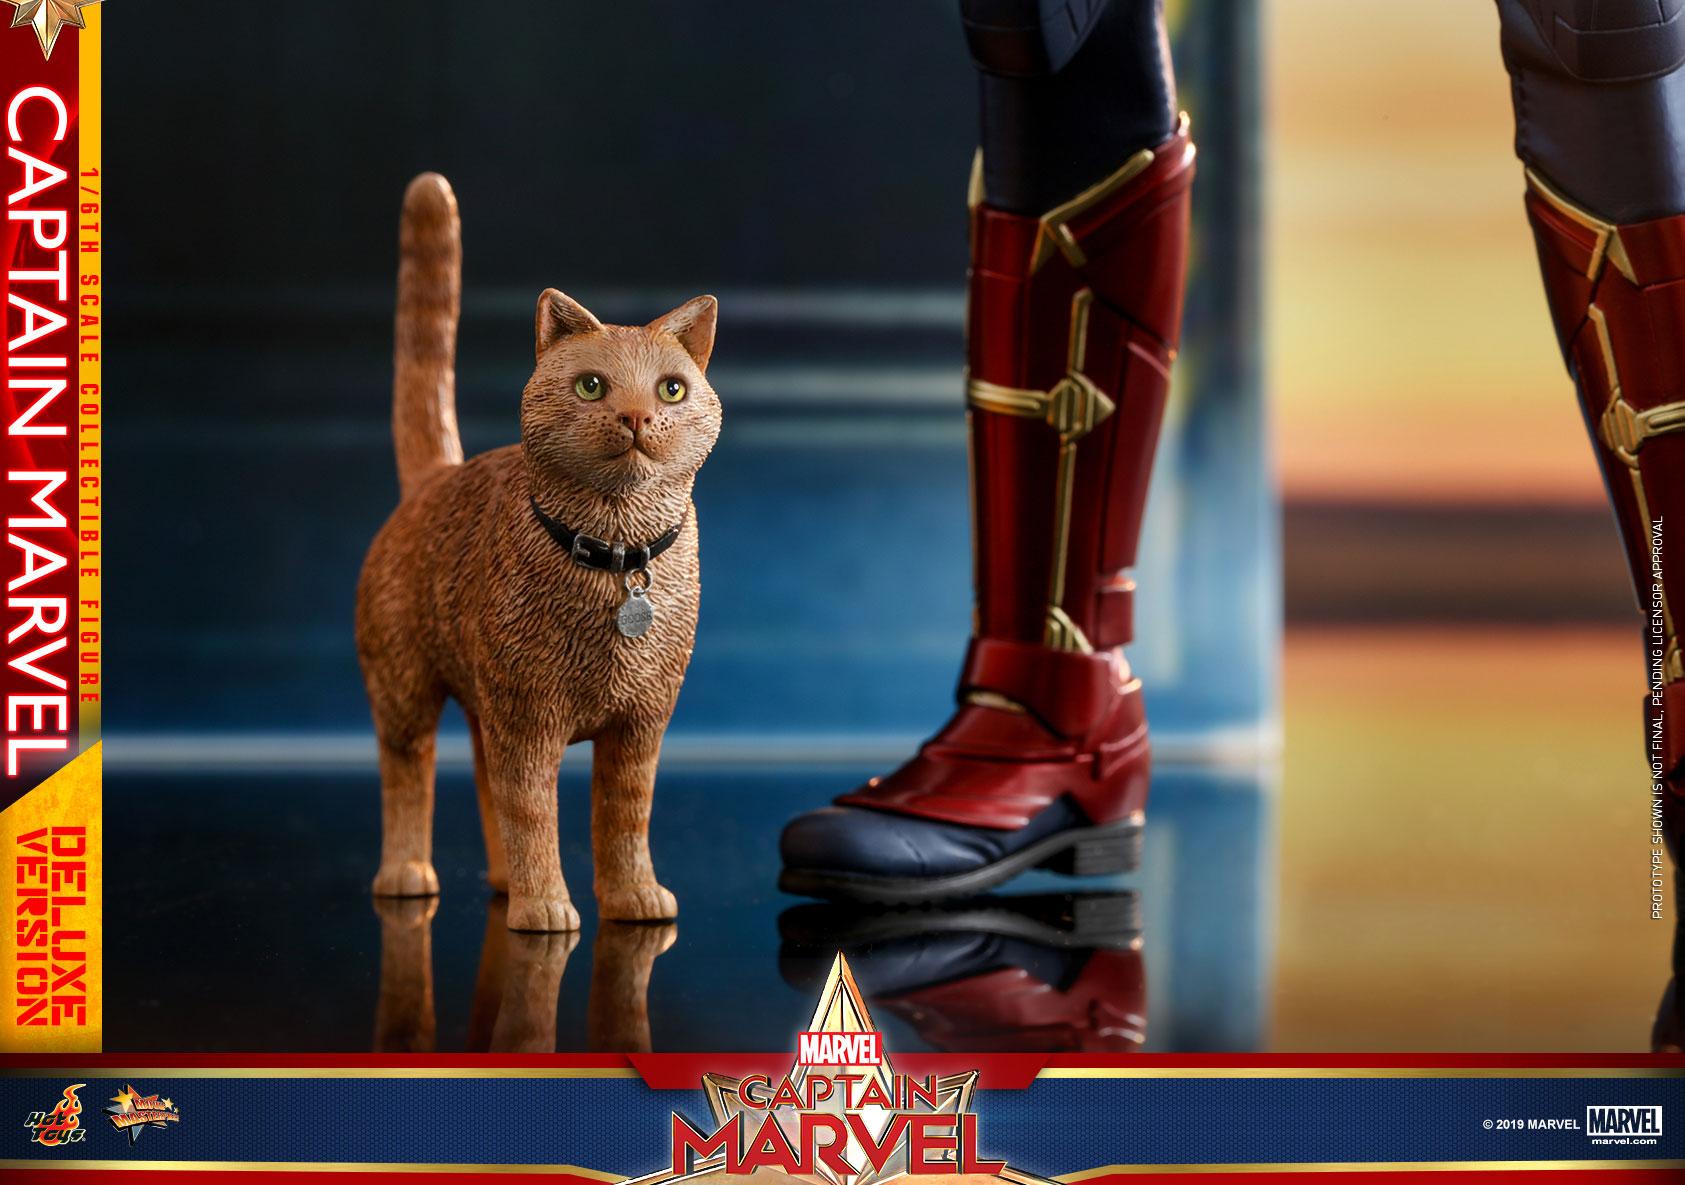 Hot-Toys---Captain-Marvel---Captain-Marvel-collectible-figure-(Deluxe)_PR22